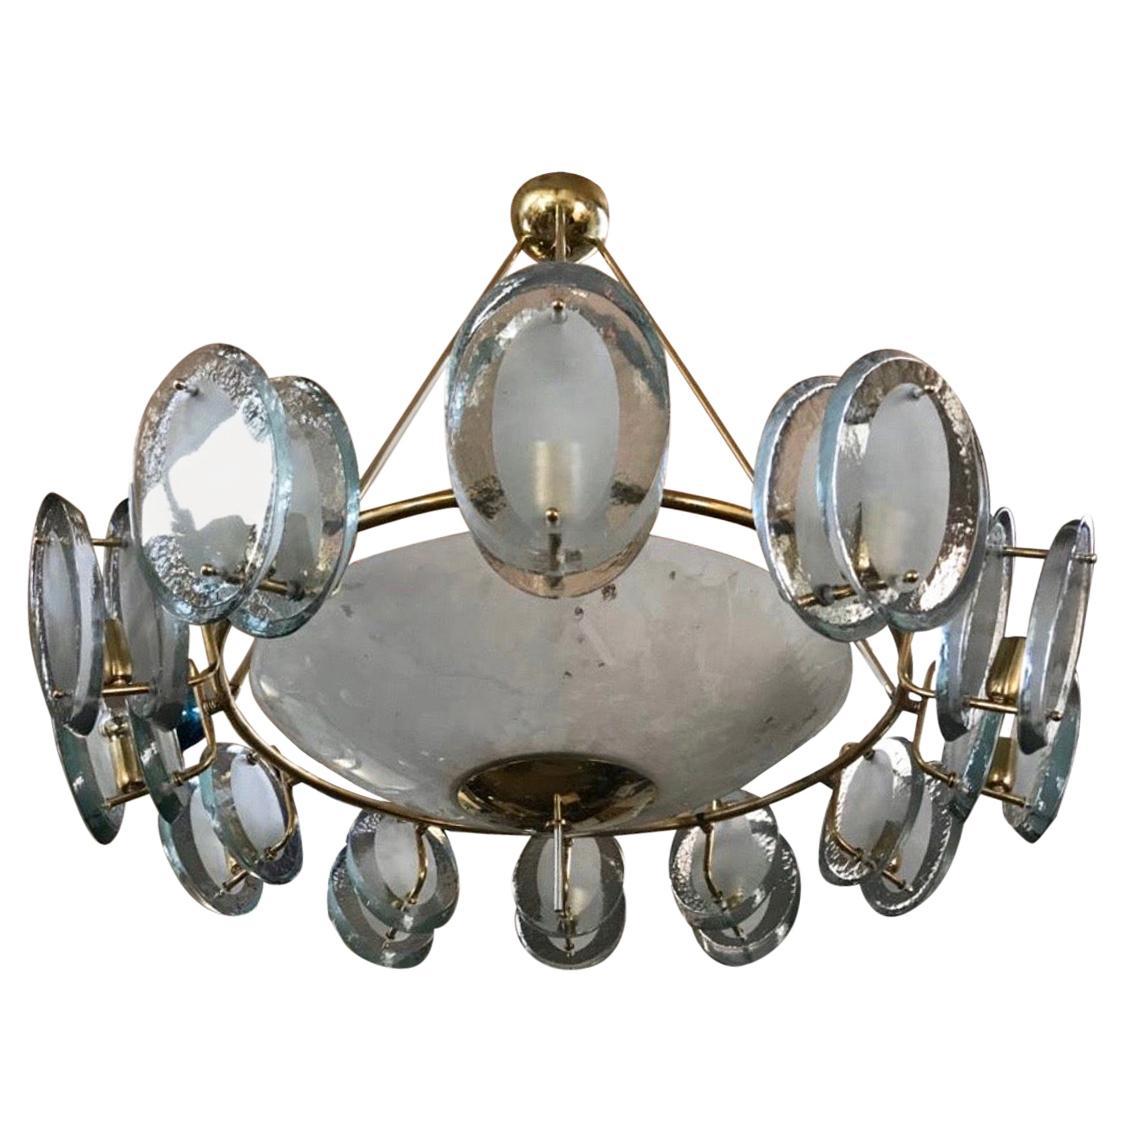 Midcentury Italian Brass and Glass Chandelier